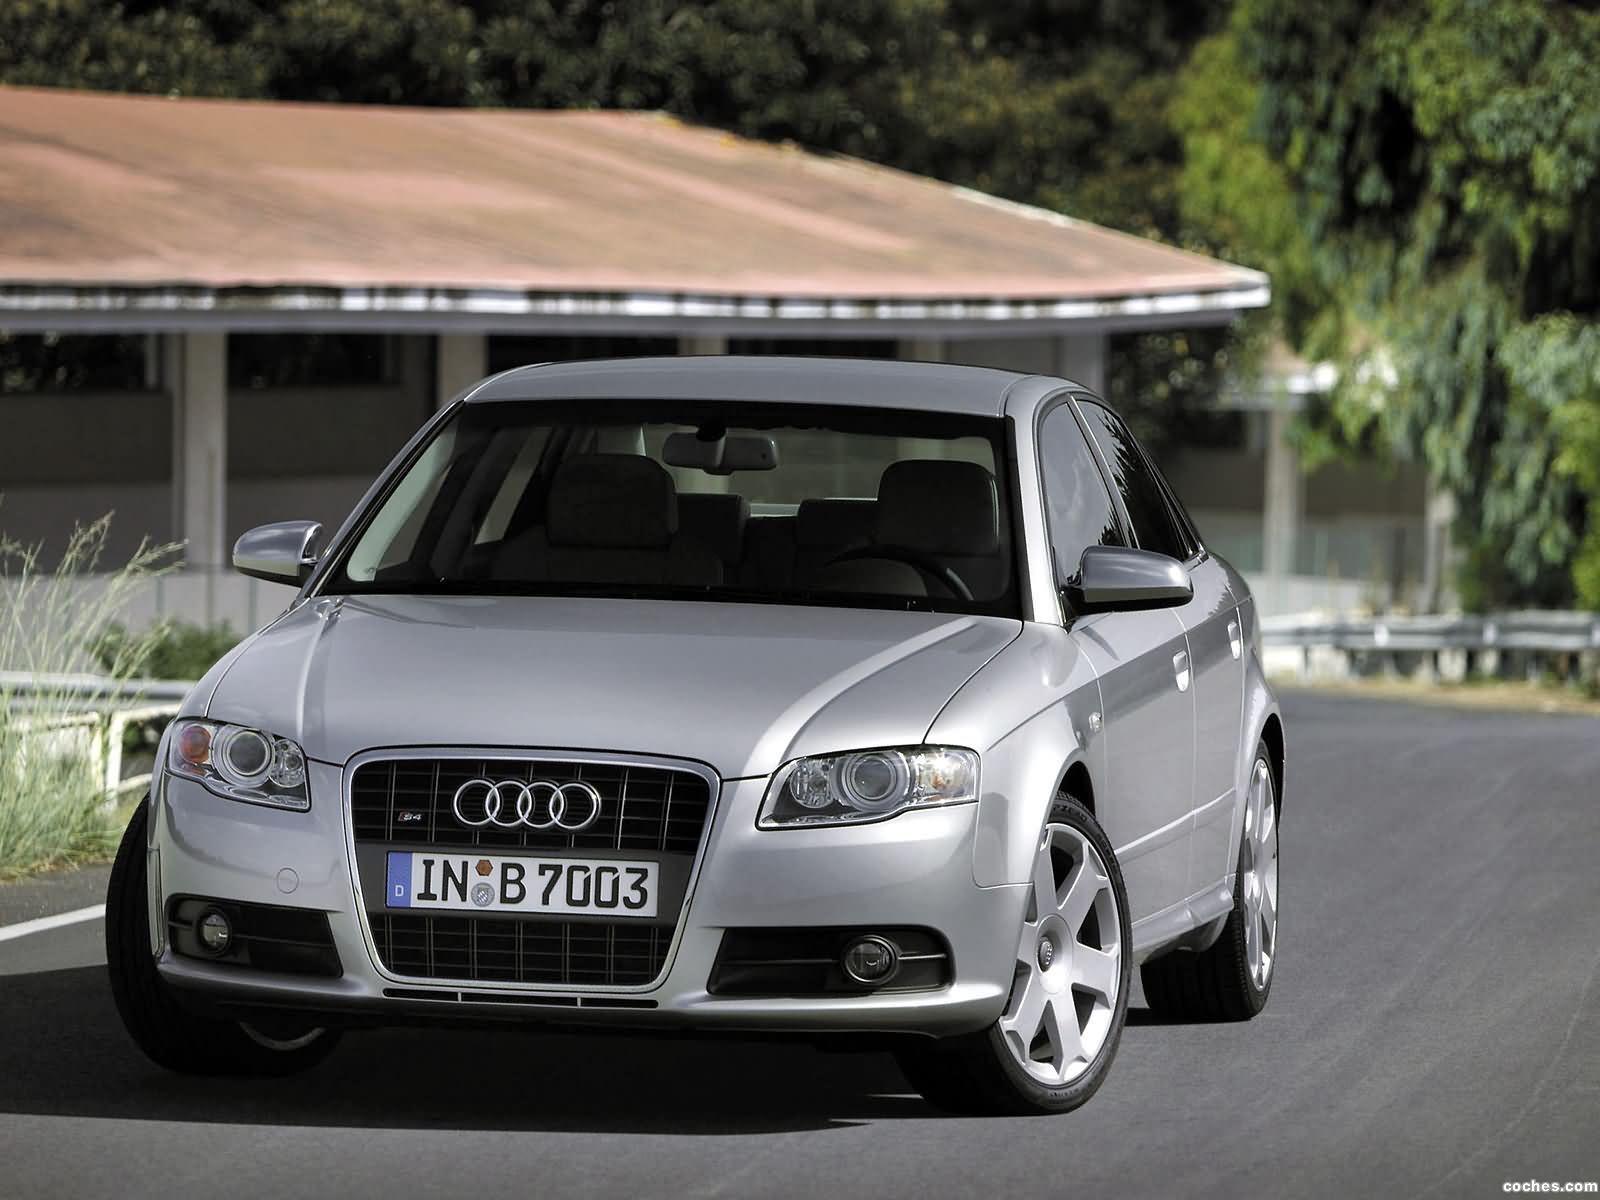 Foto 7 de Audi S4 2005